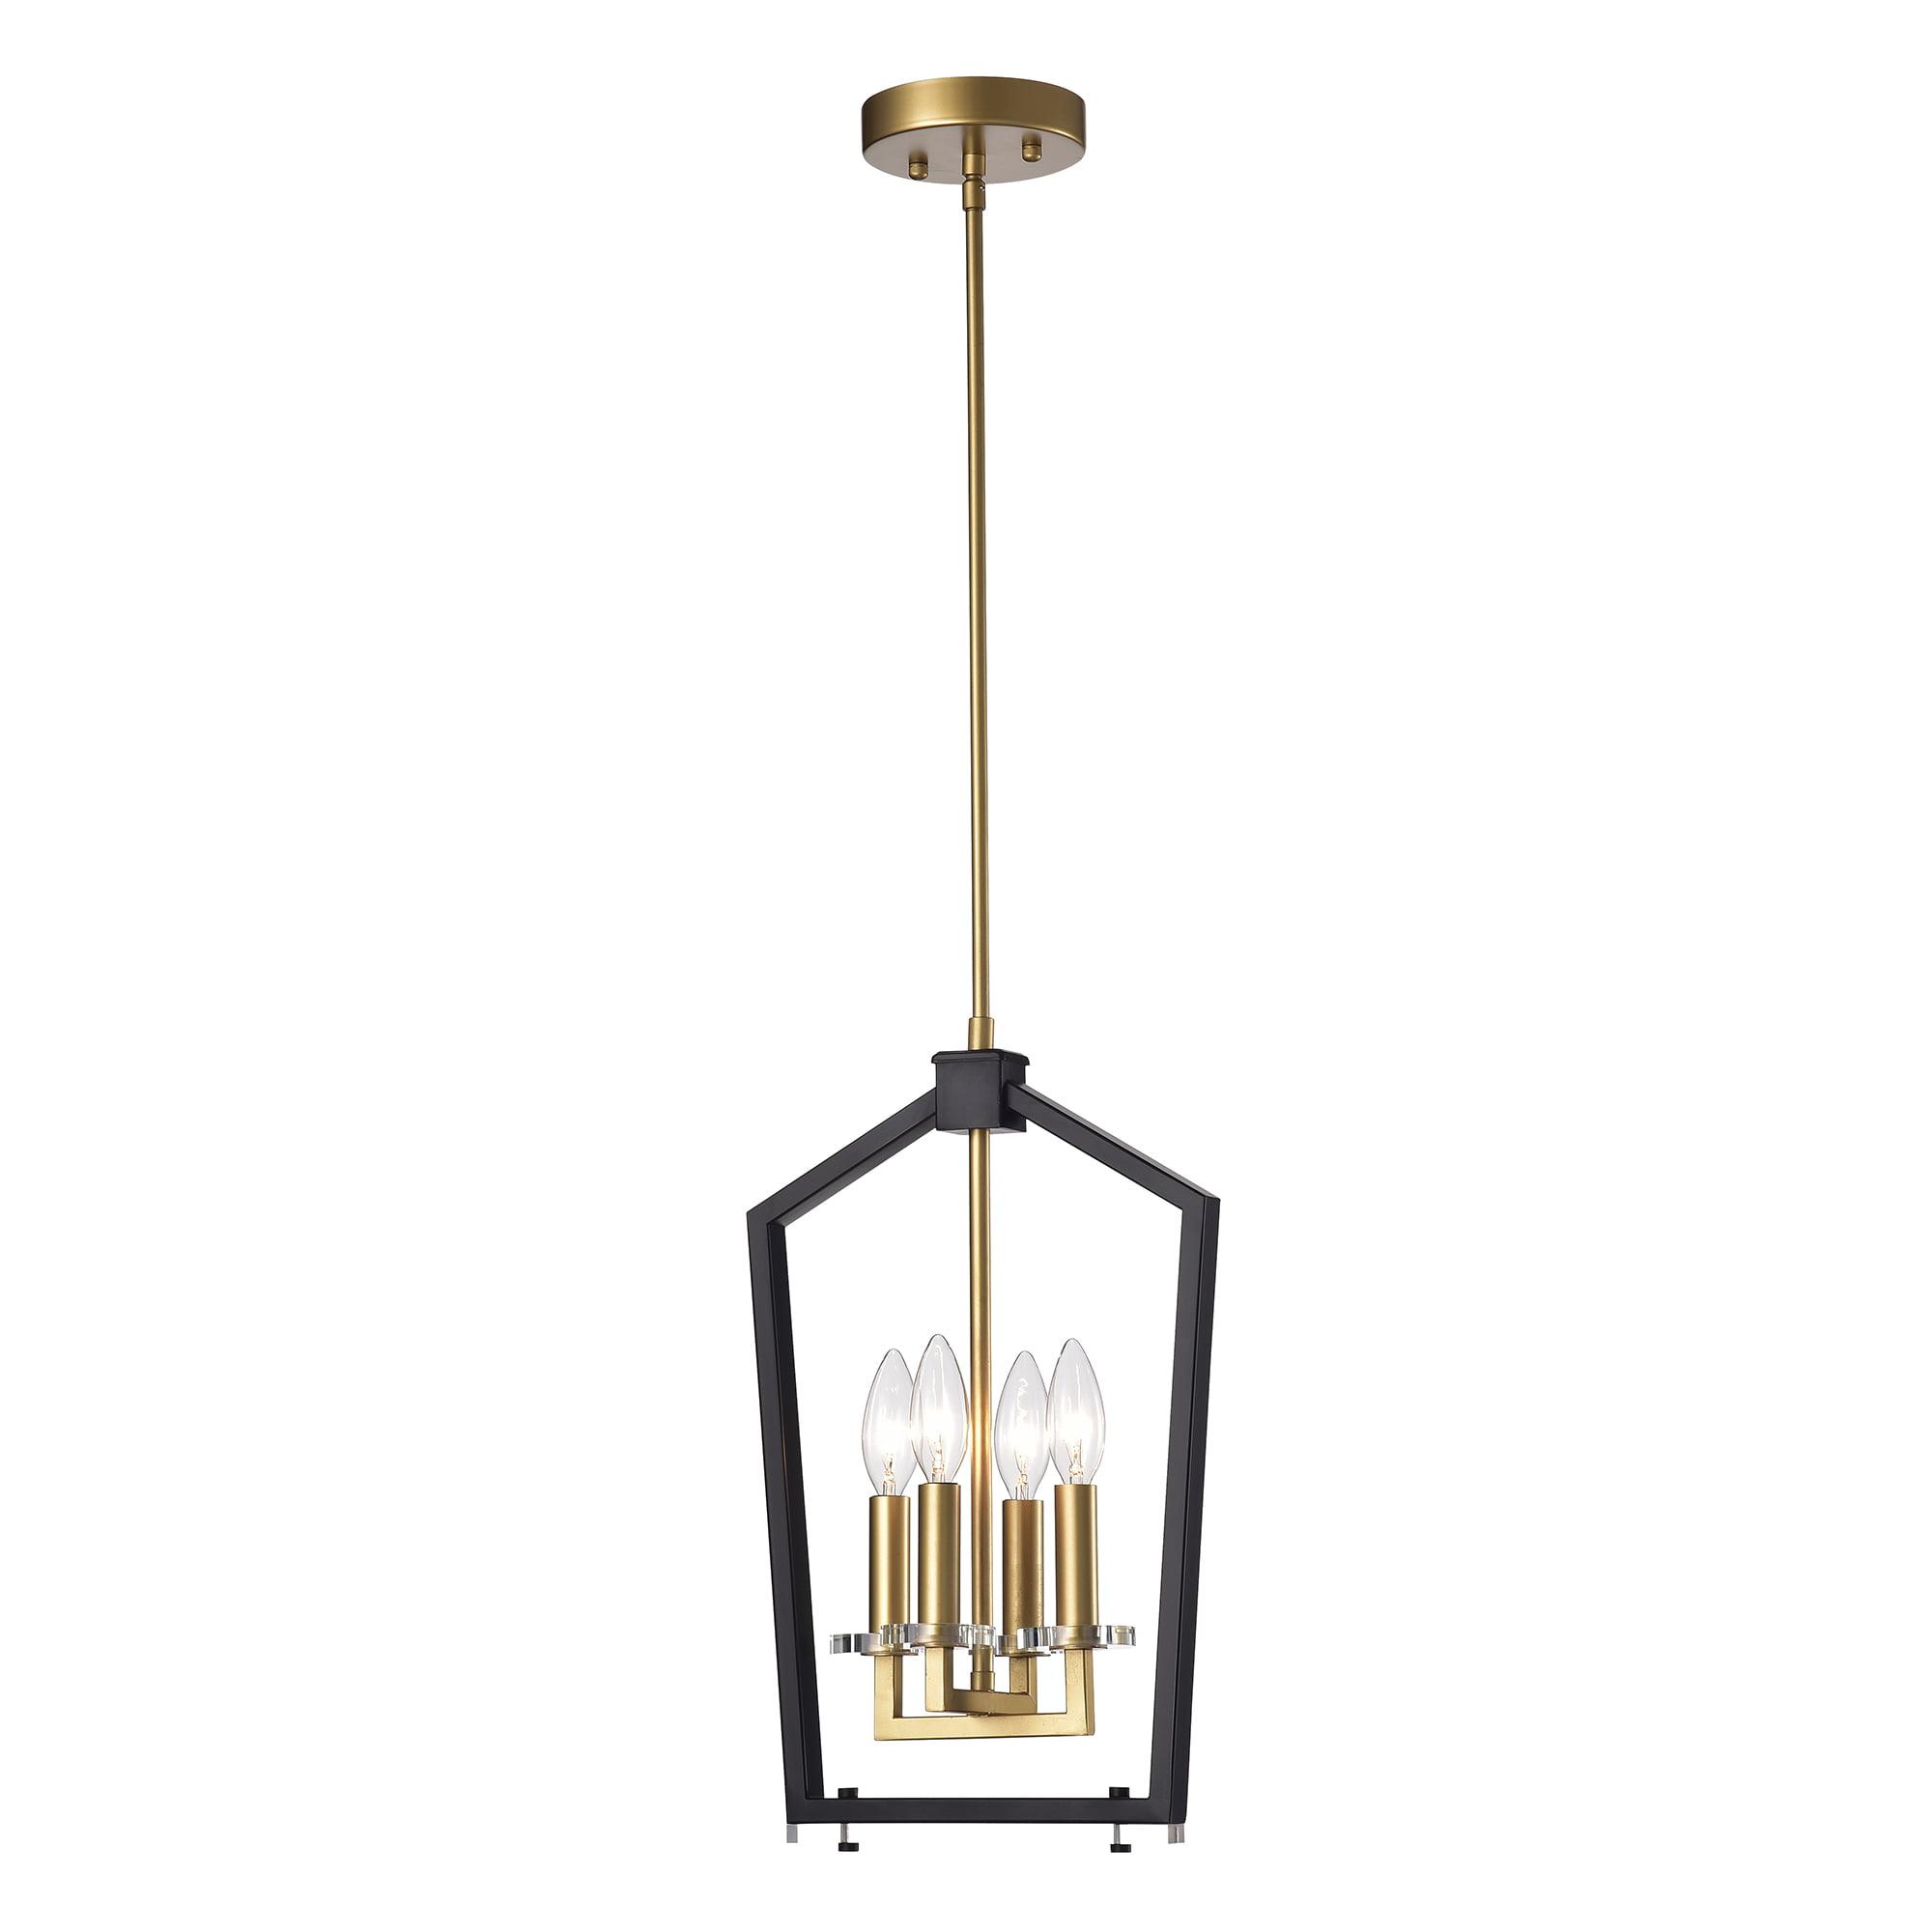 Ikea Loft Copper Brass Bowl Mirror Glass Bar Art Modern Ceiling Pendant Lamp Home Garden Lamps Lighting Ceiling Fans